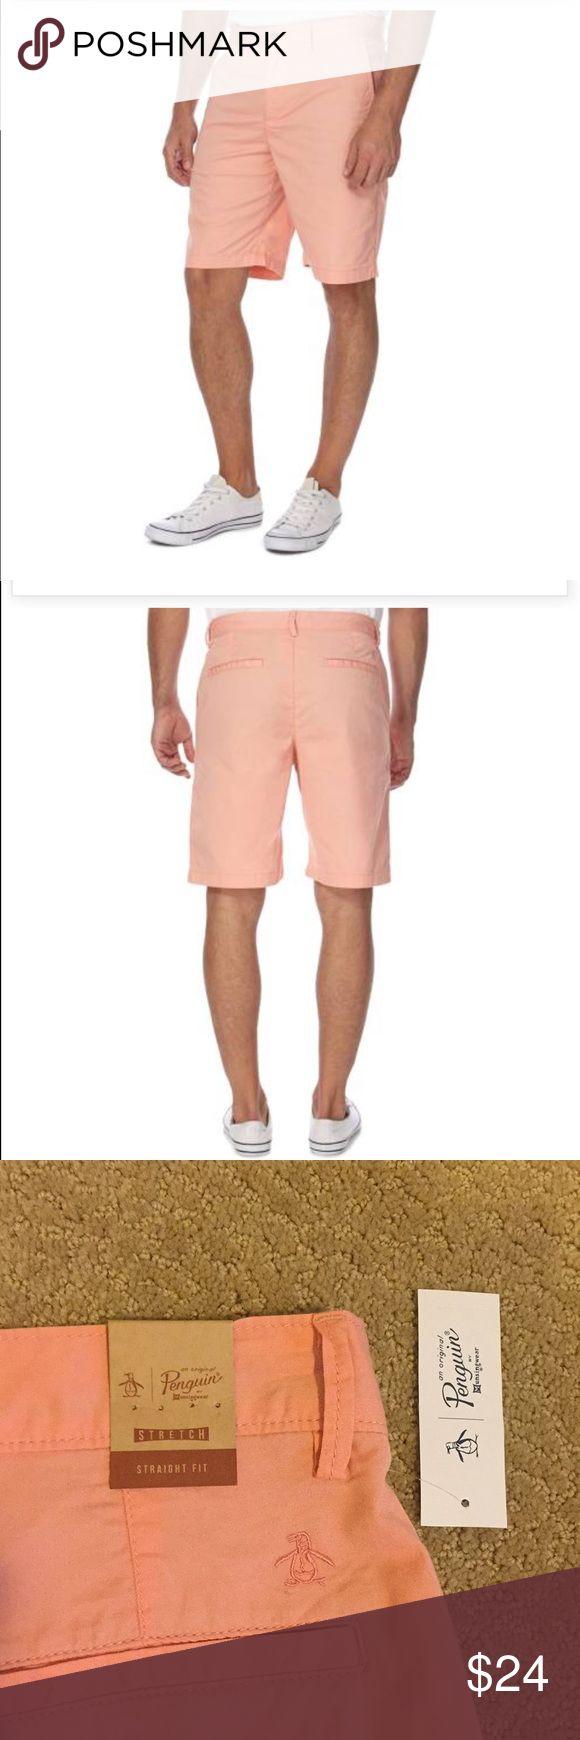 NWT men's penguin straight fit shorts, size 32 NWT men's Penguin straight fit shorts. Size 32. Color: coral almond. 98 percent cotton. 2 percent elastane. BEAUTIFUL. Original Penguin Shorts